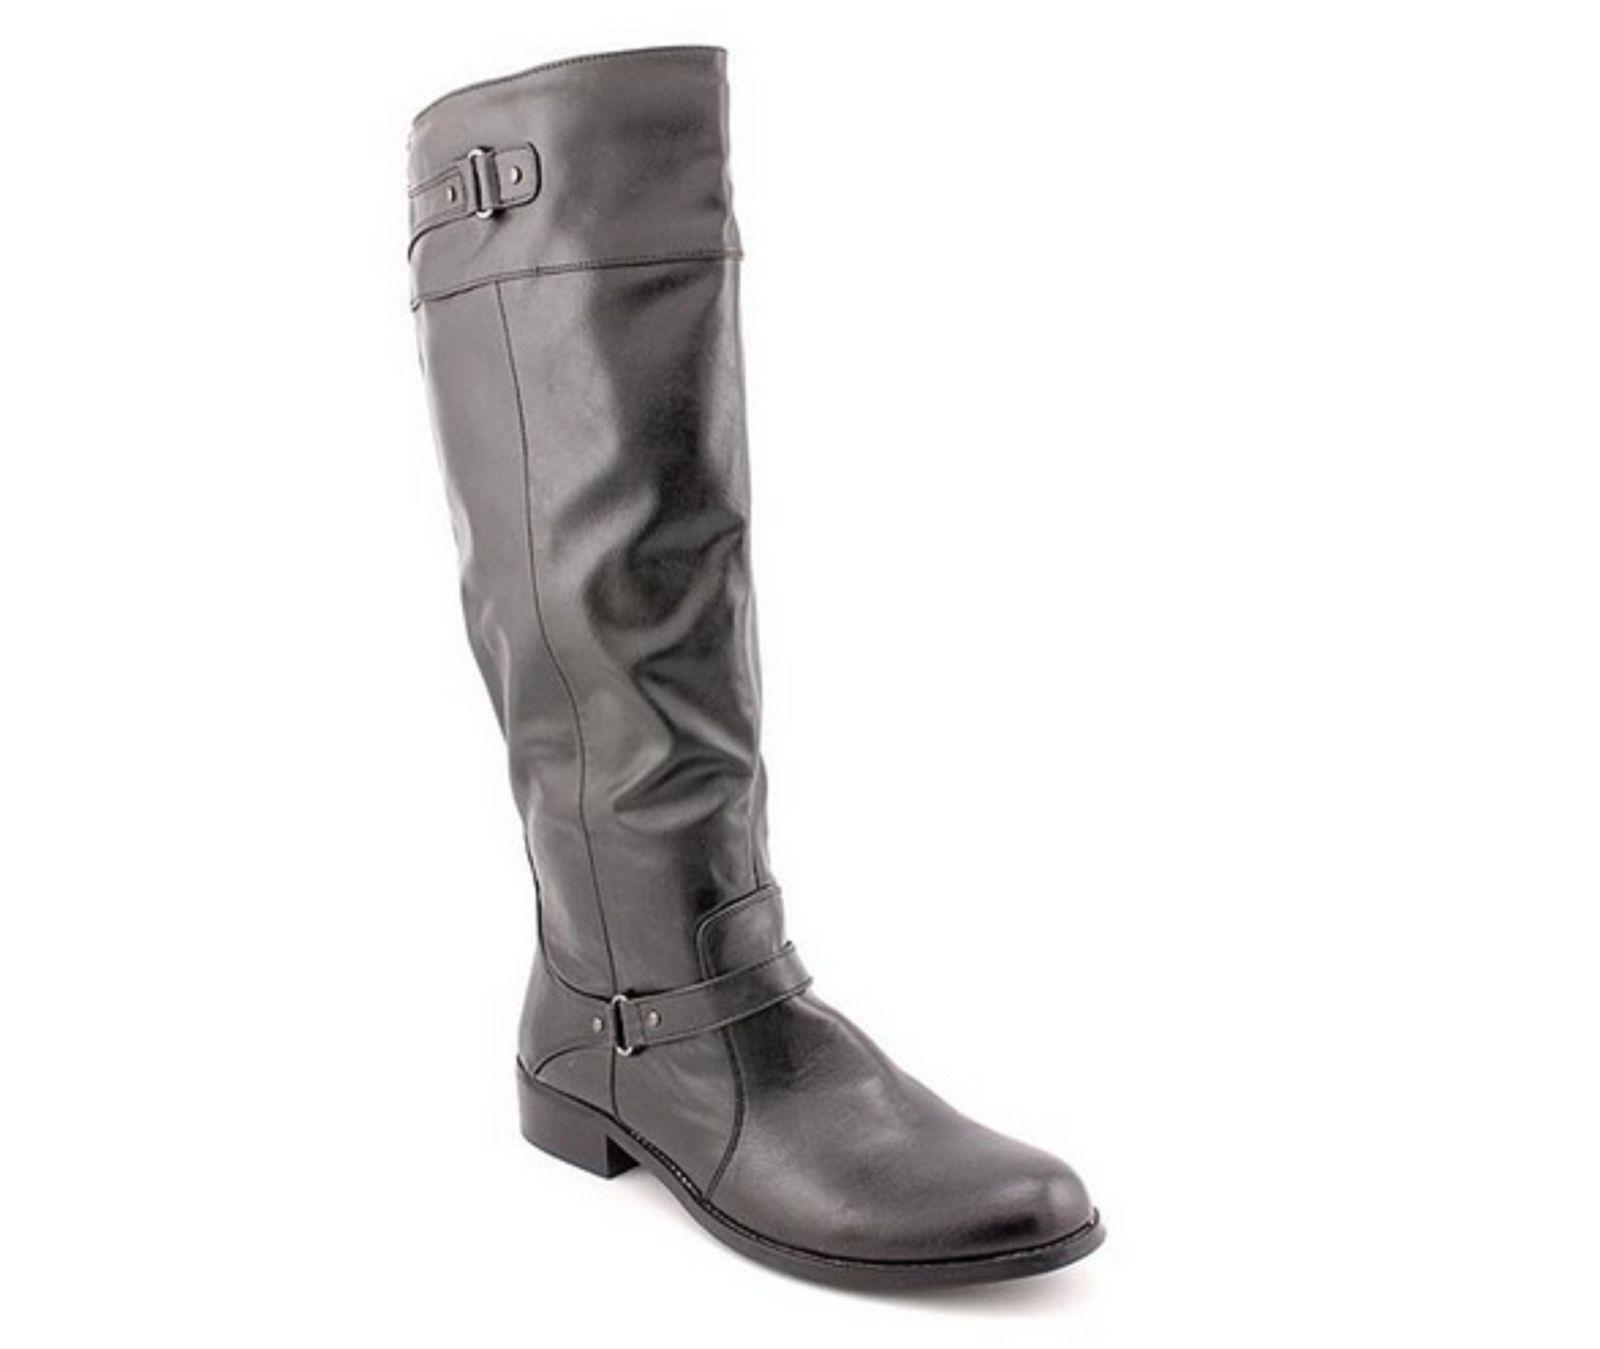 Alfani Jessa Women's Knee High,Wide Calf Boots, Black, Size 6.5M New